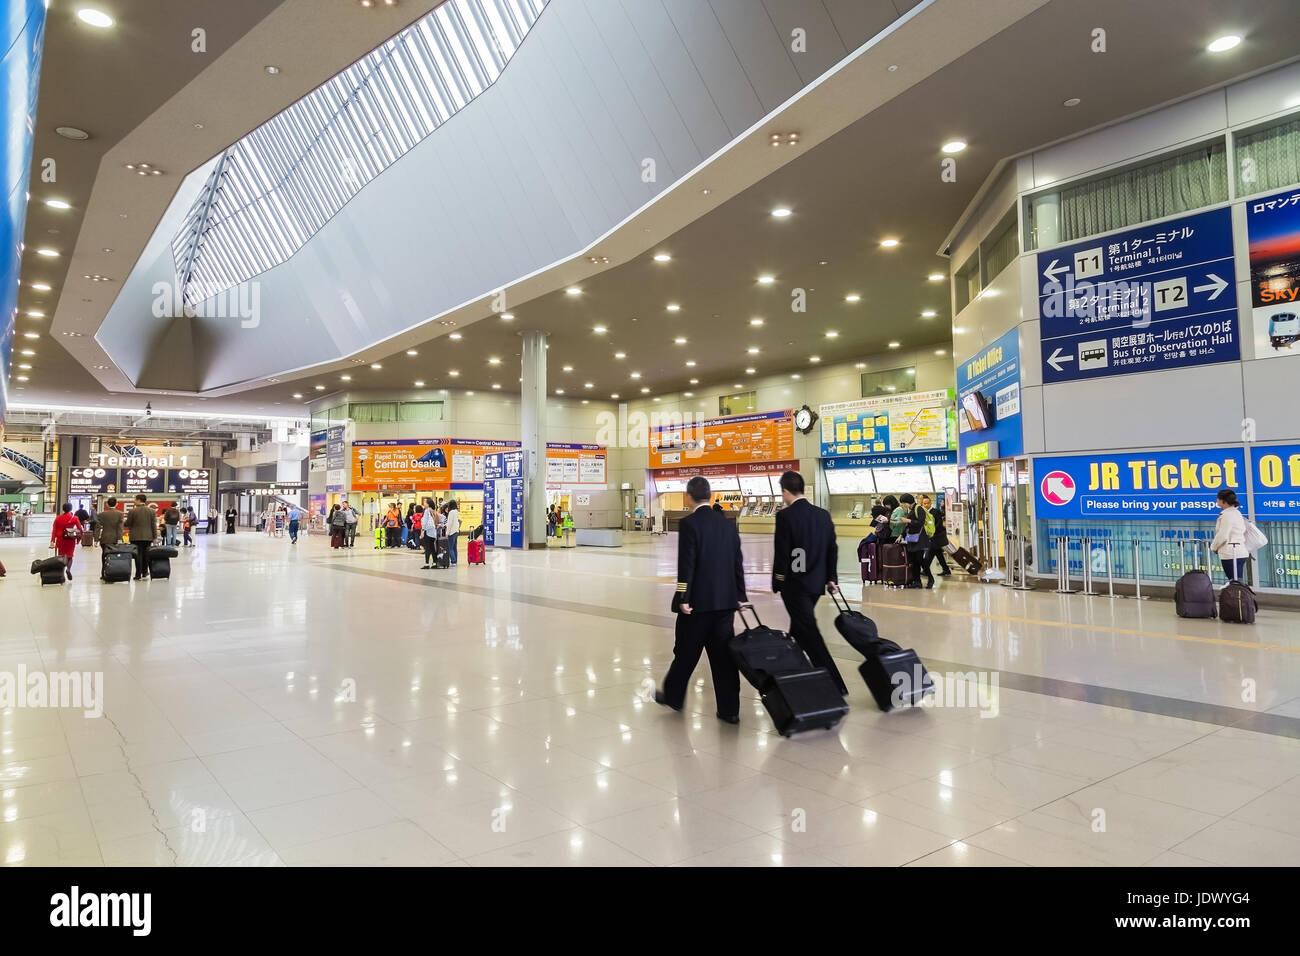 Kansai Airport Station in Osaka, Japan - Stock Image